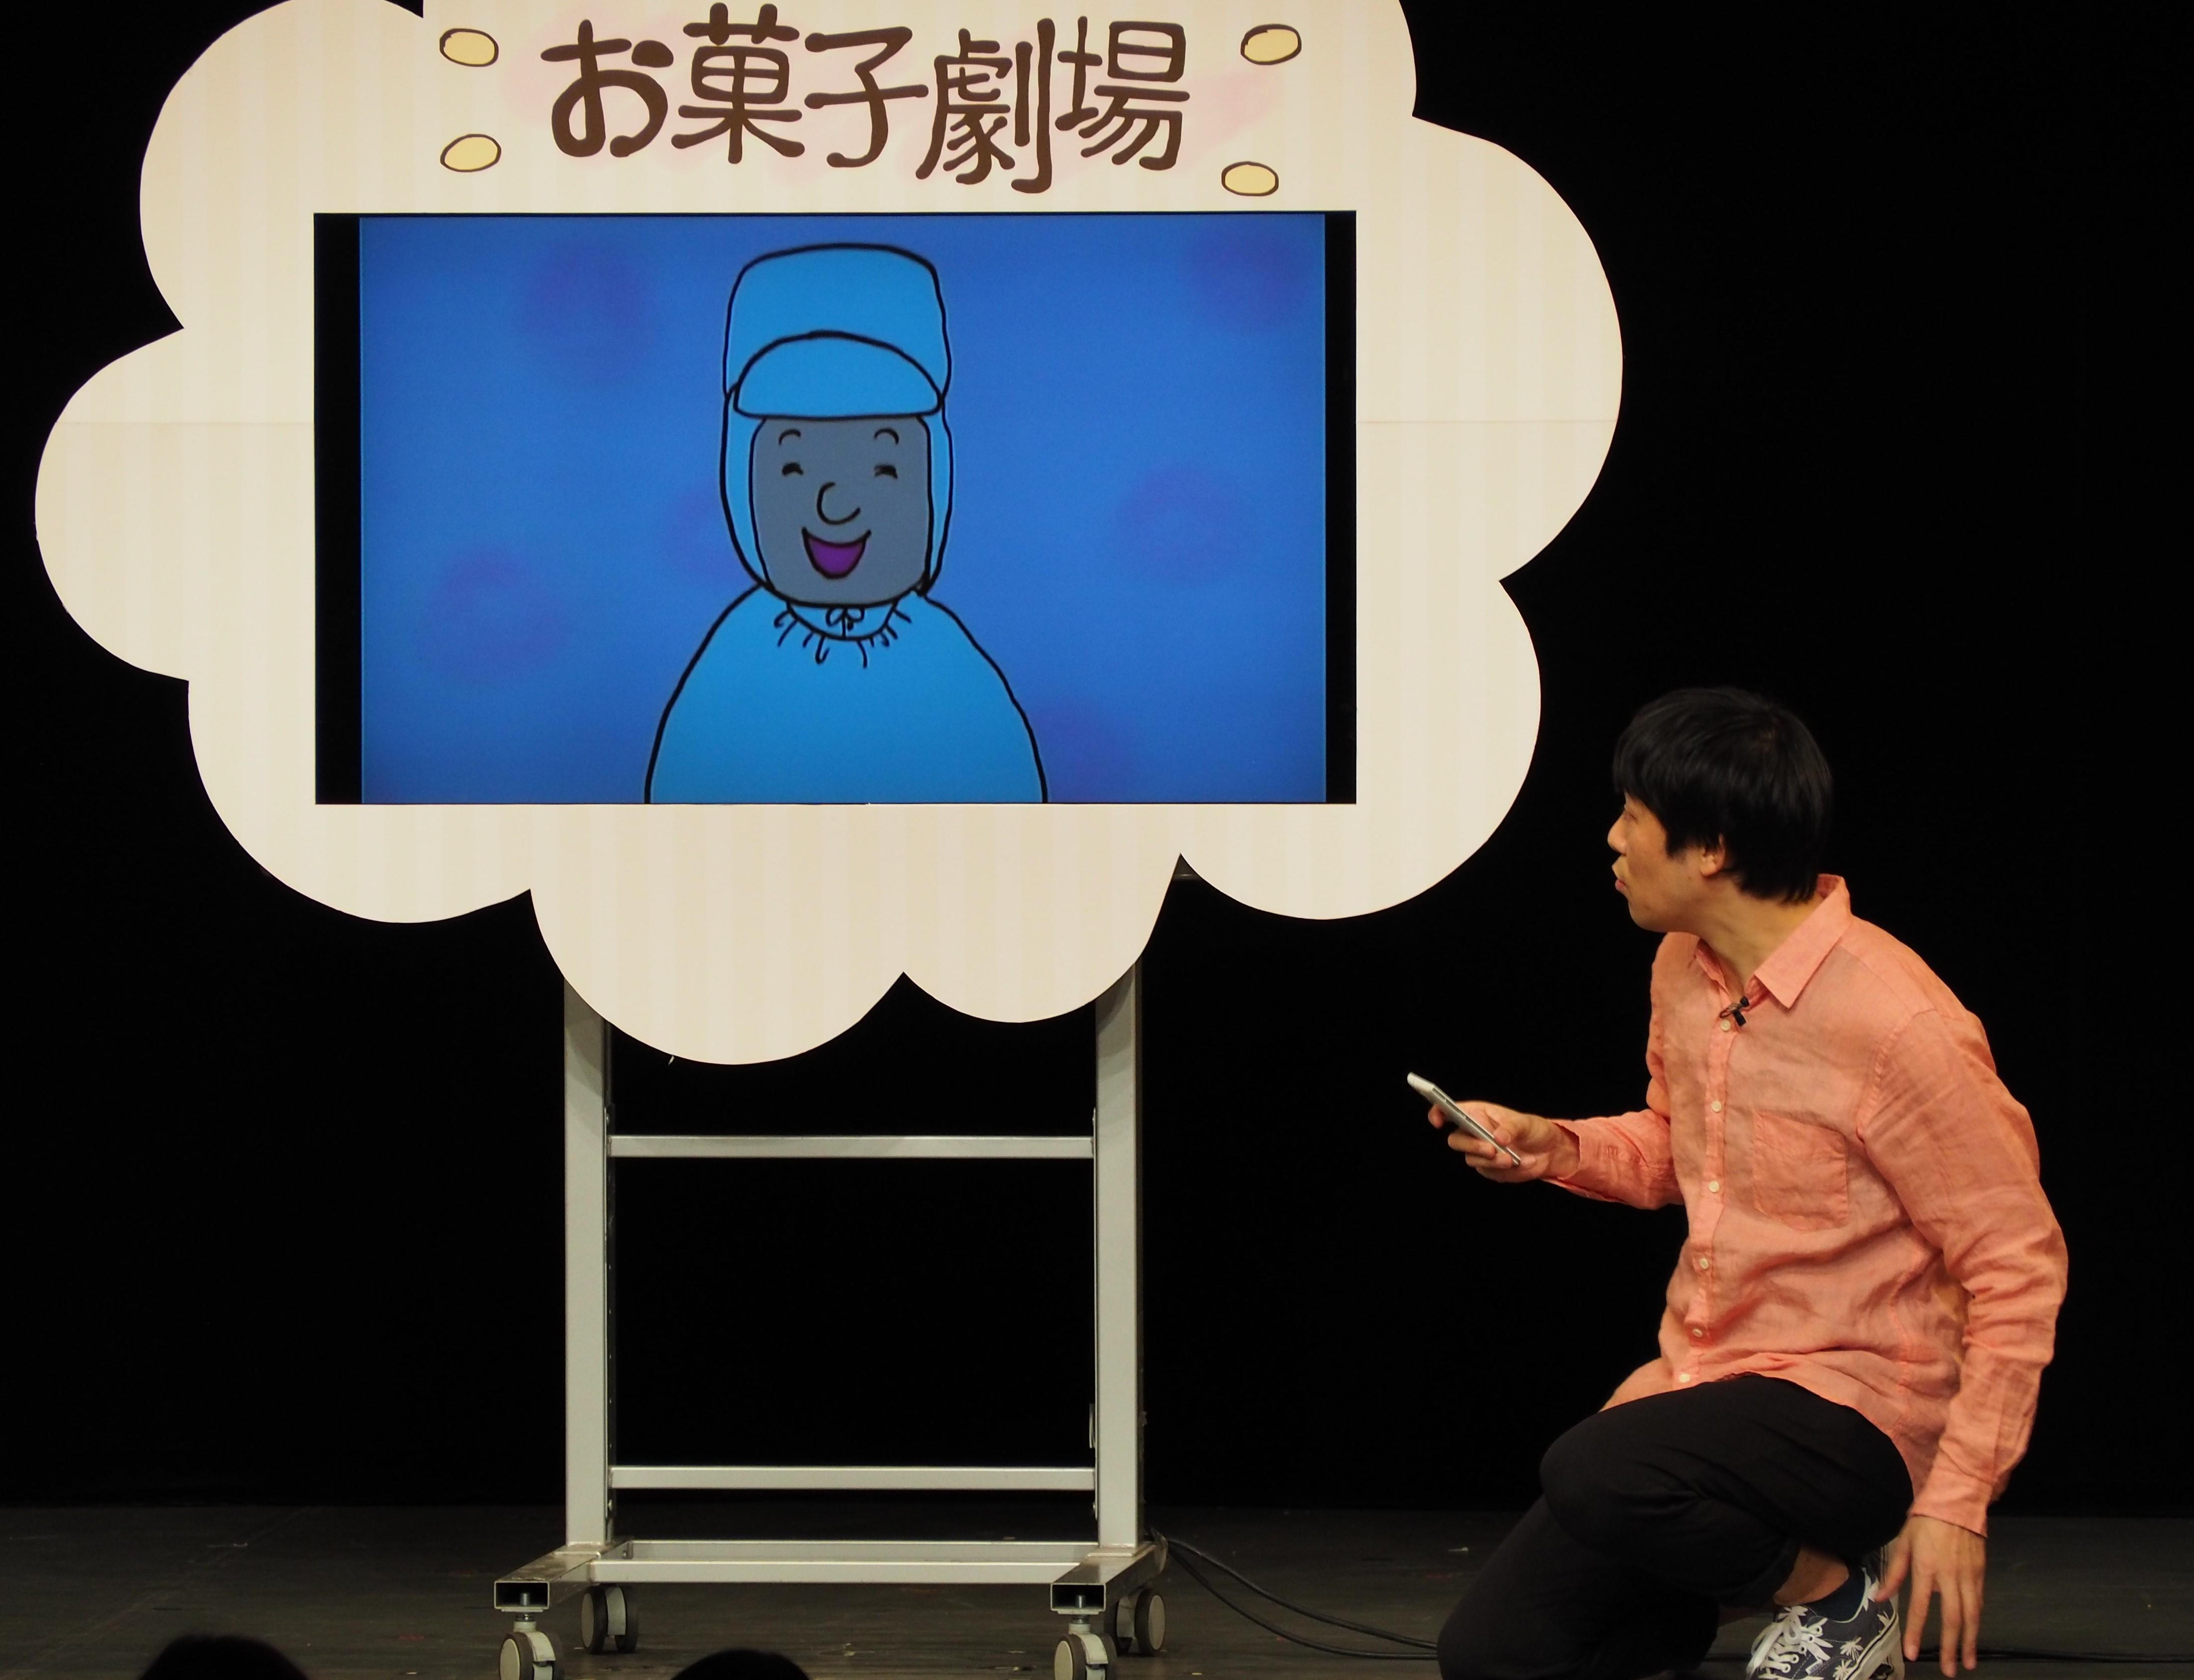 http://news.yoshimoto.co.jp/20171230201300-507a699b113adc70a6f97b101ee7d2bd94c81f71.jpg